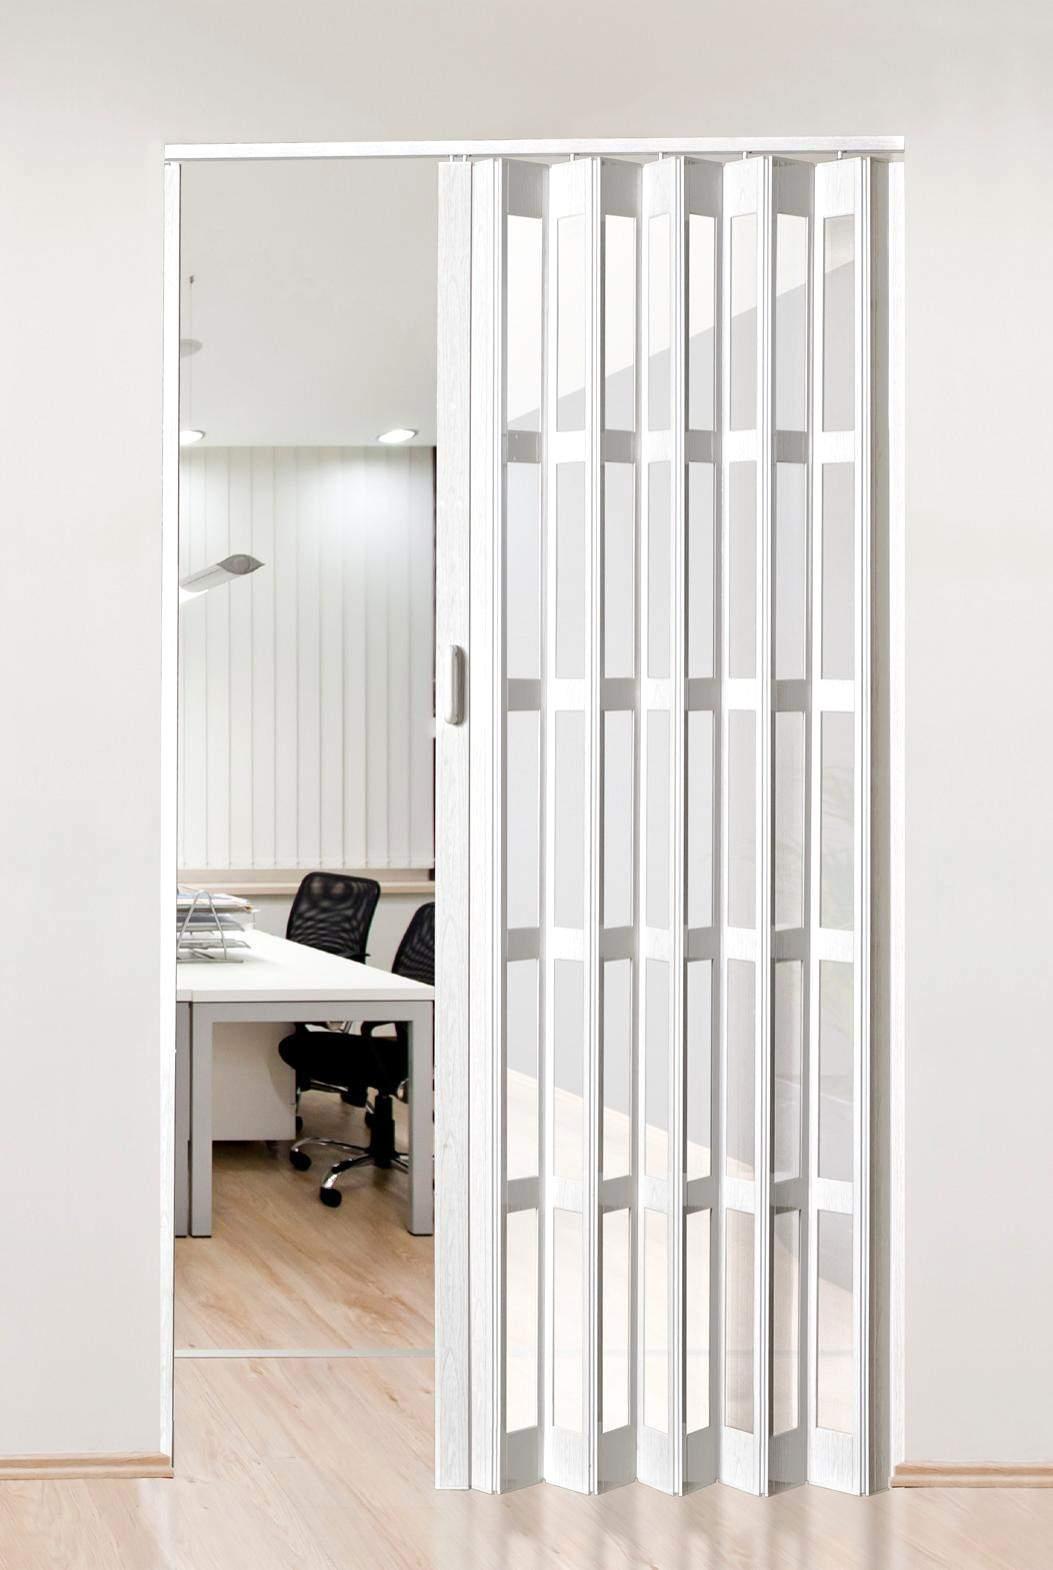 simulateur peinture castorama altoservices. Black Bedroom Furniture Sets. Home Design Ideas